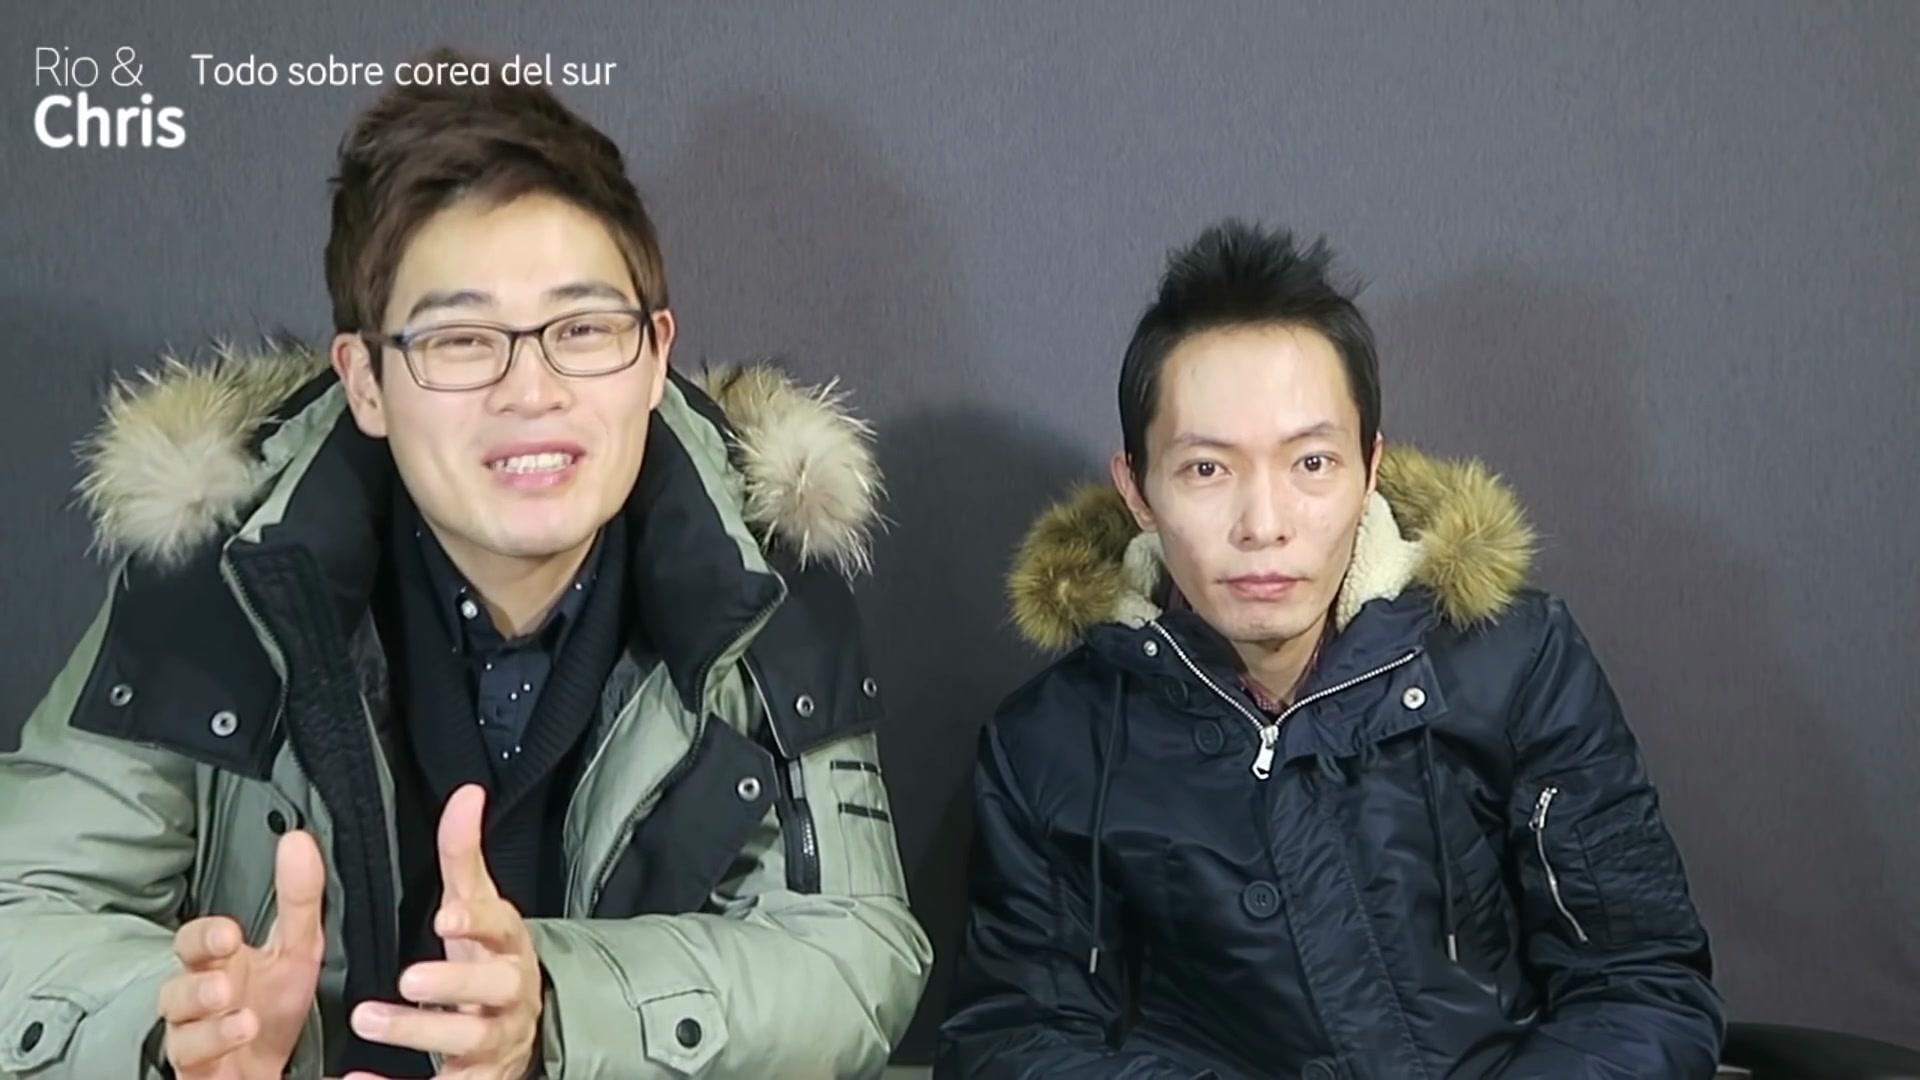 Todo Sobre Corea del Sur Episode 118: Koreans React to '69 Cosas que Solo Pasan en Corea del Sur'